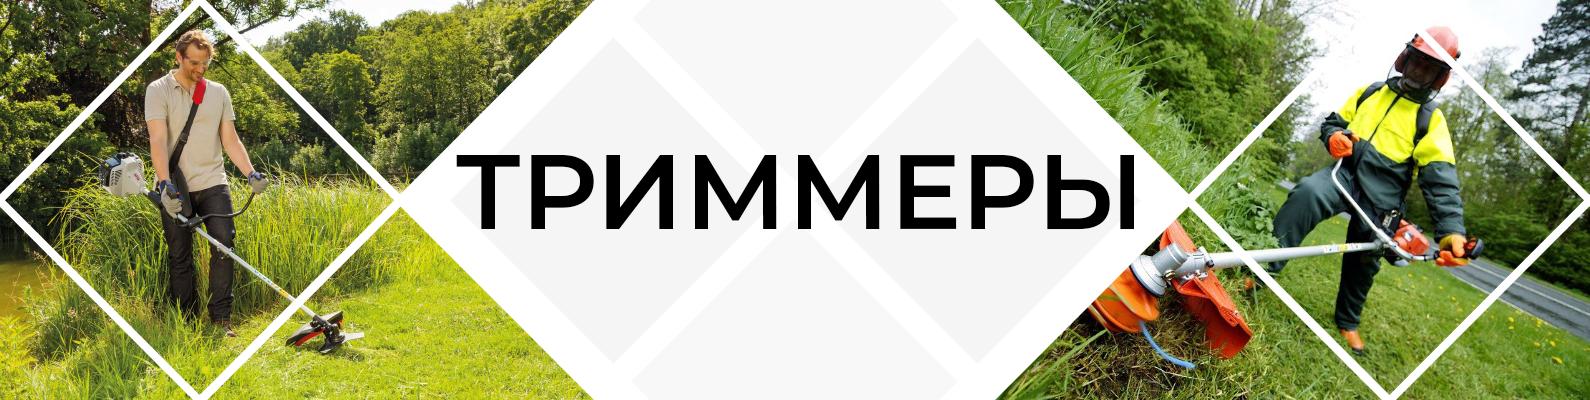 Триммеры